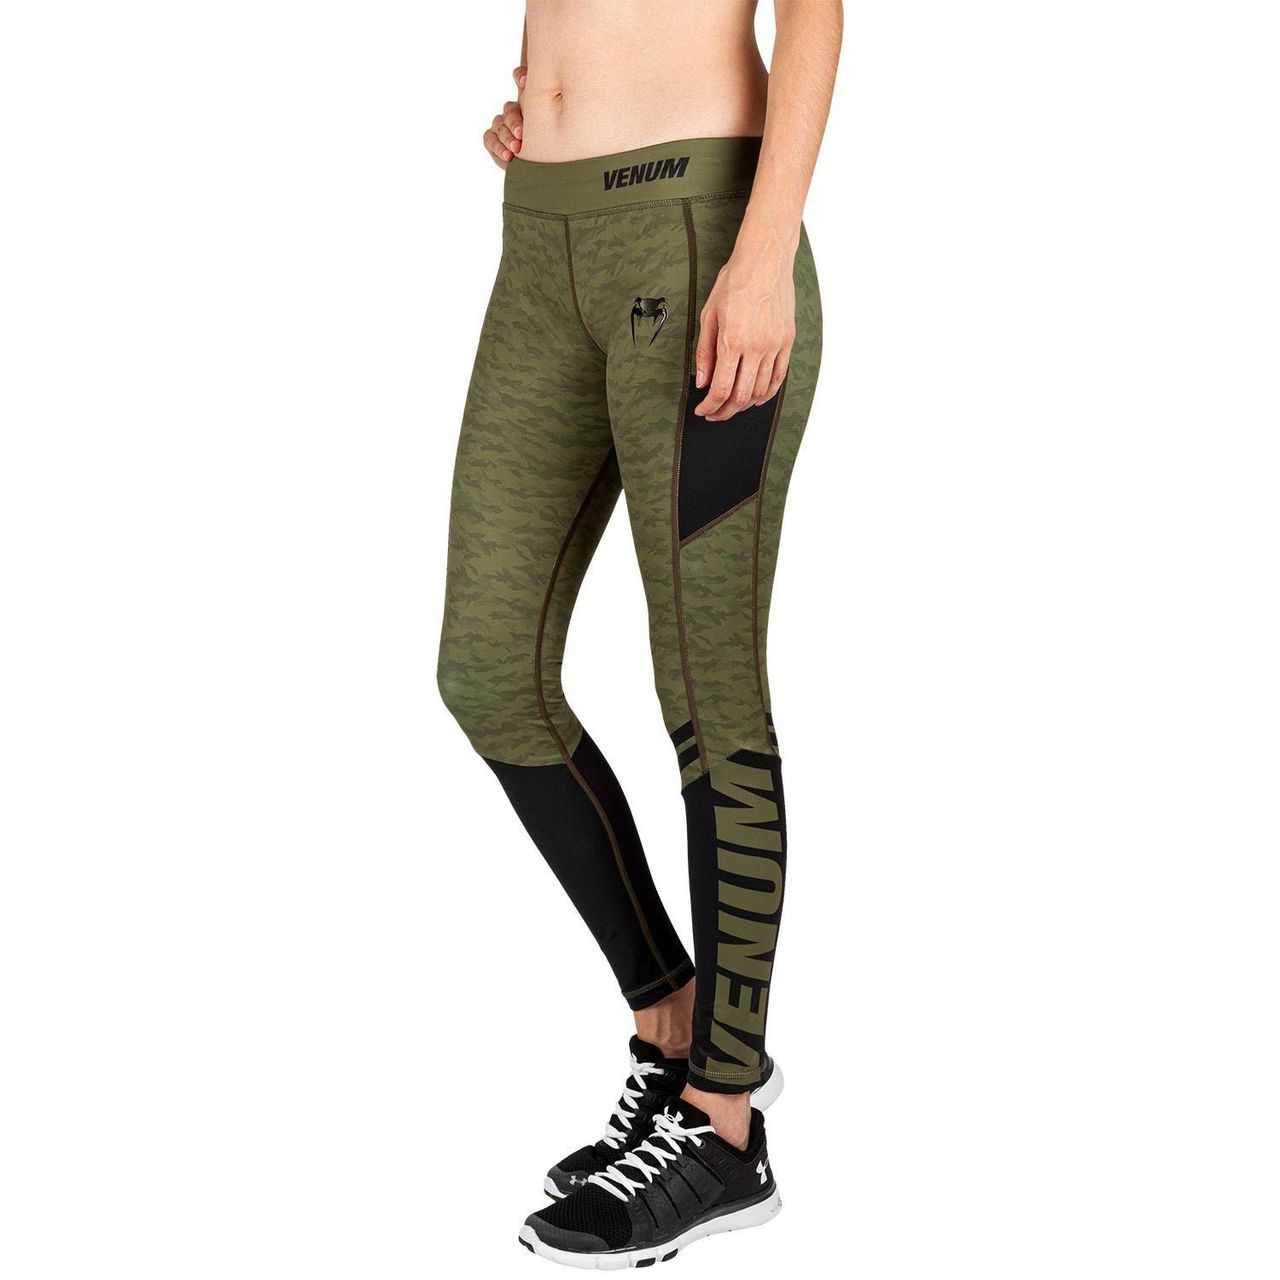 Venum Womens Power 2.0 Leggings Fitness Clothing